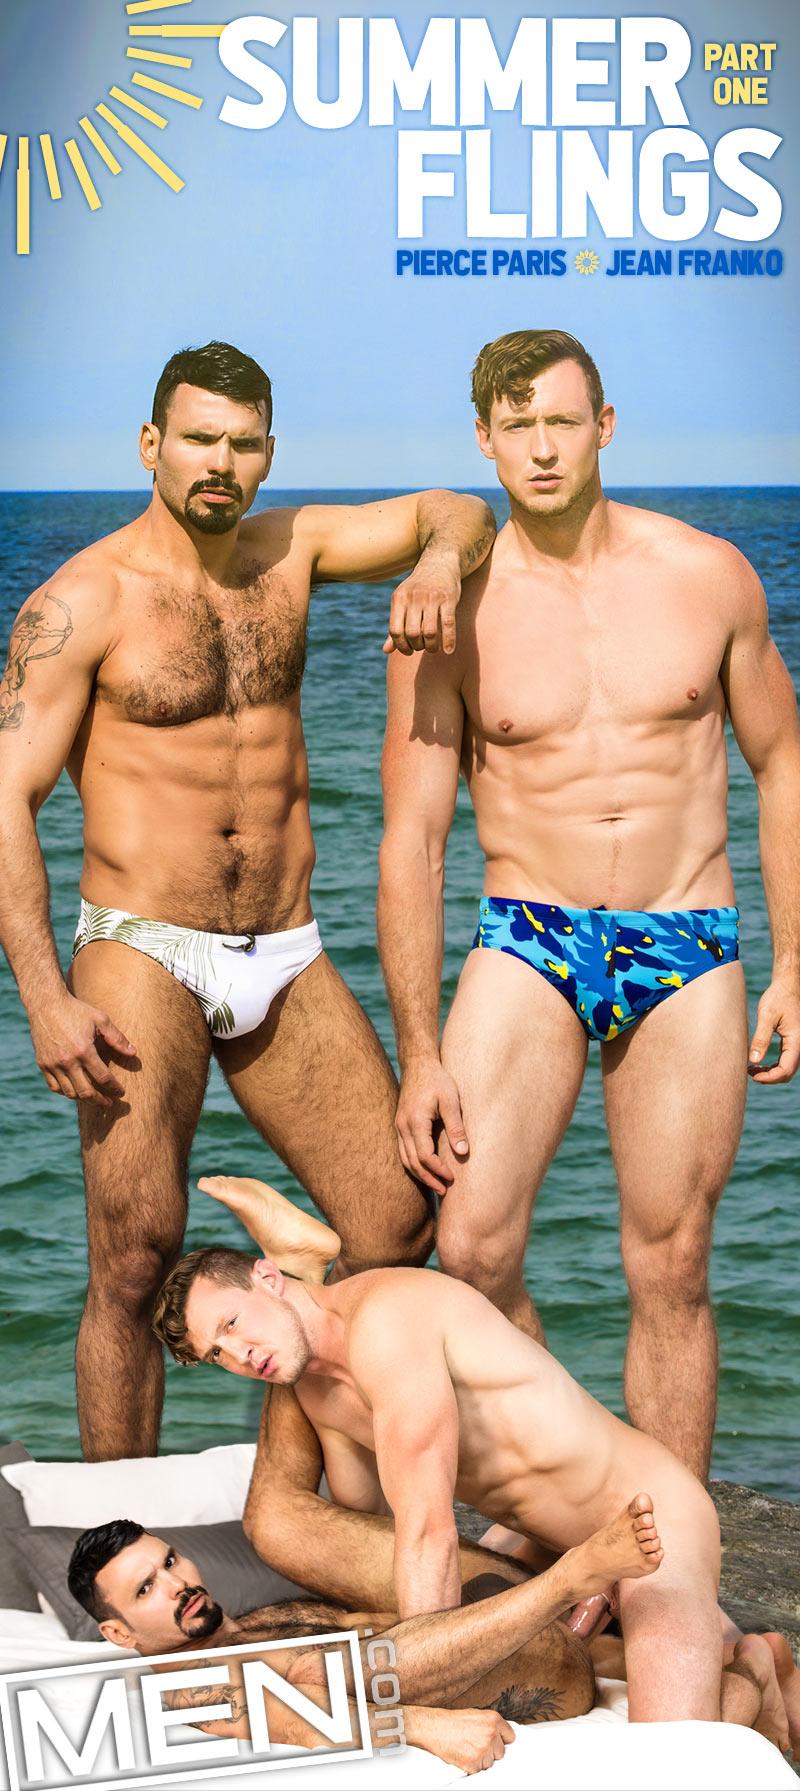 Summer Flings: Part 1 (Pierce Paris and Jean Franko Flip-Fuck) at Gods Of Men